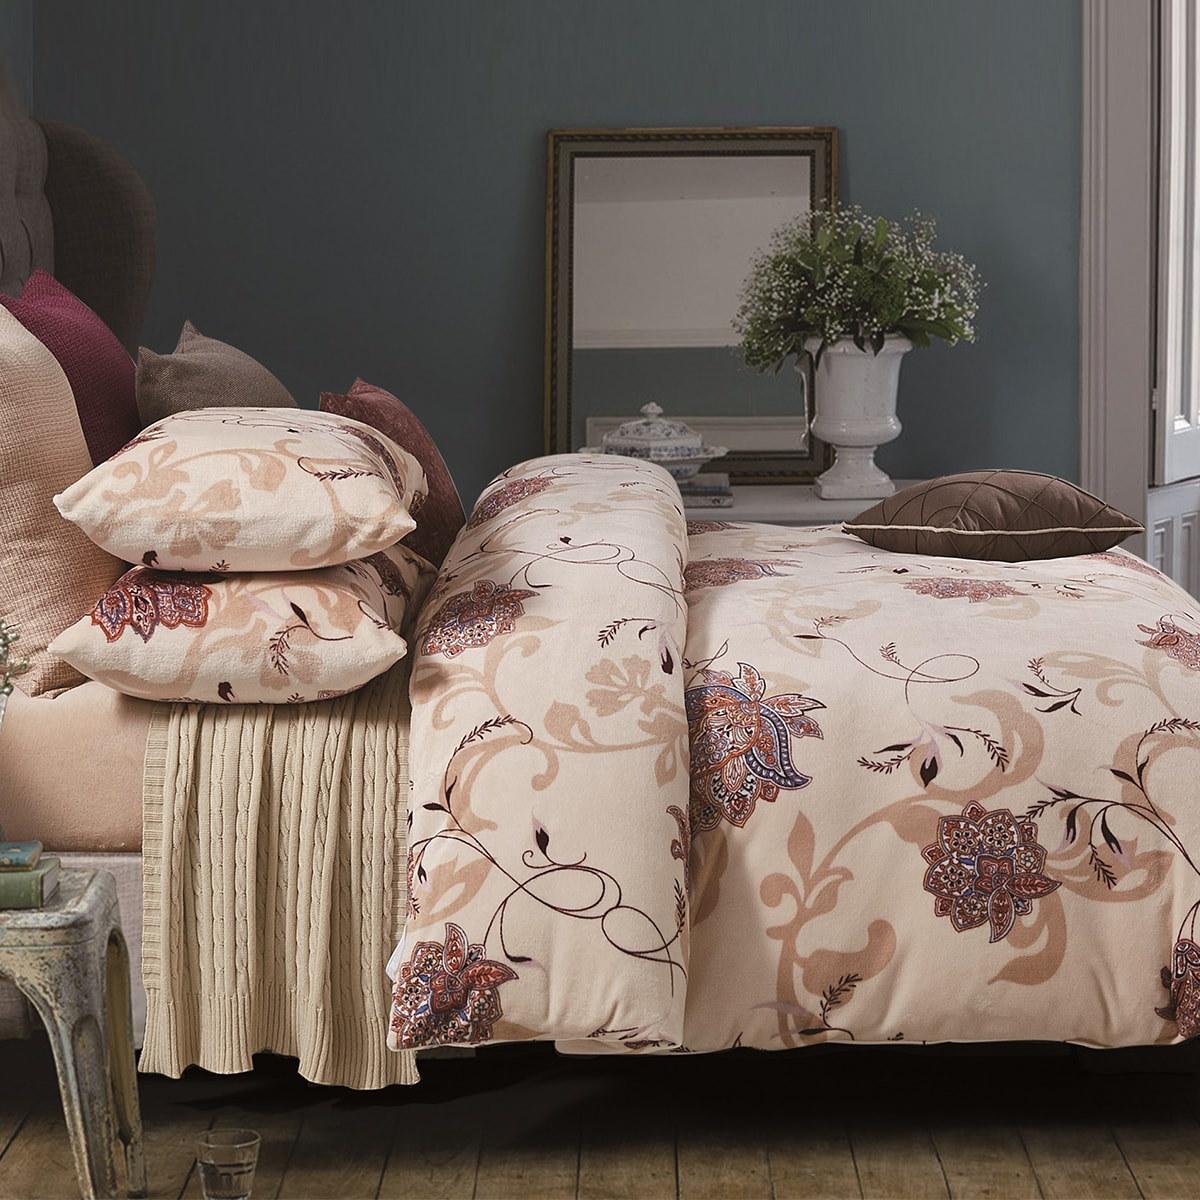 Softitex法蘭絨刷毛床組4件組